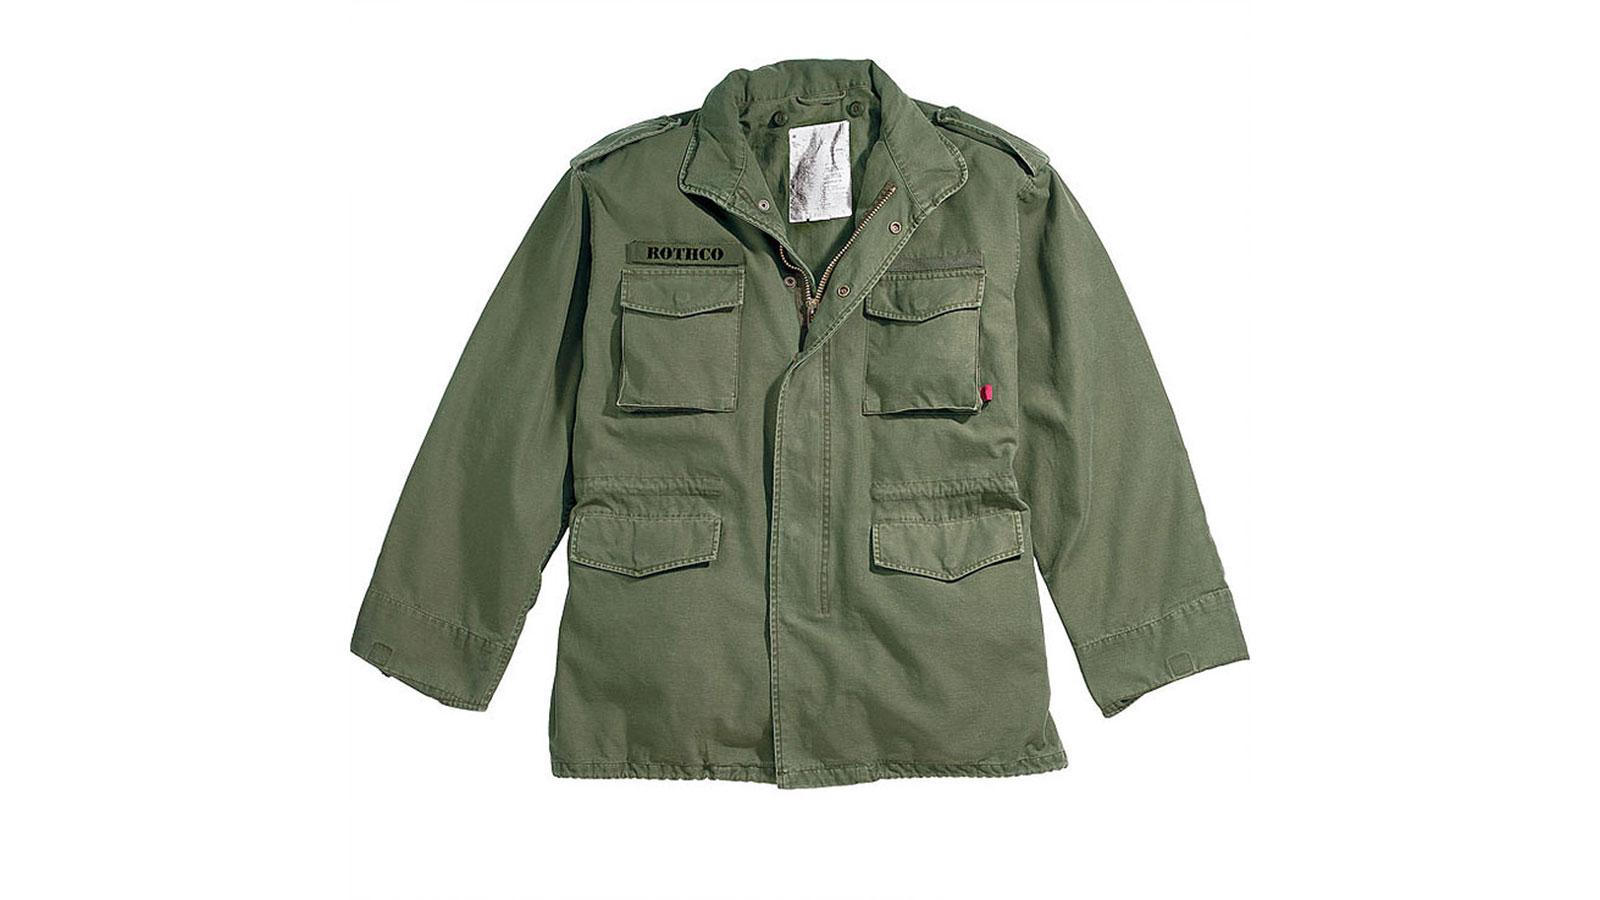 US Army Vintage m65 Field Jacket Men's Winter Fashion